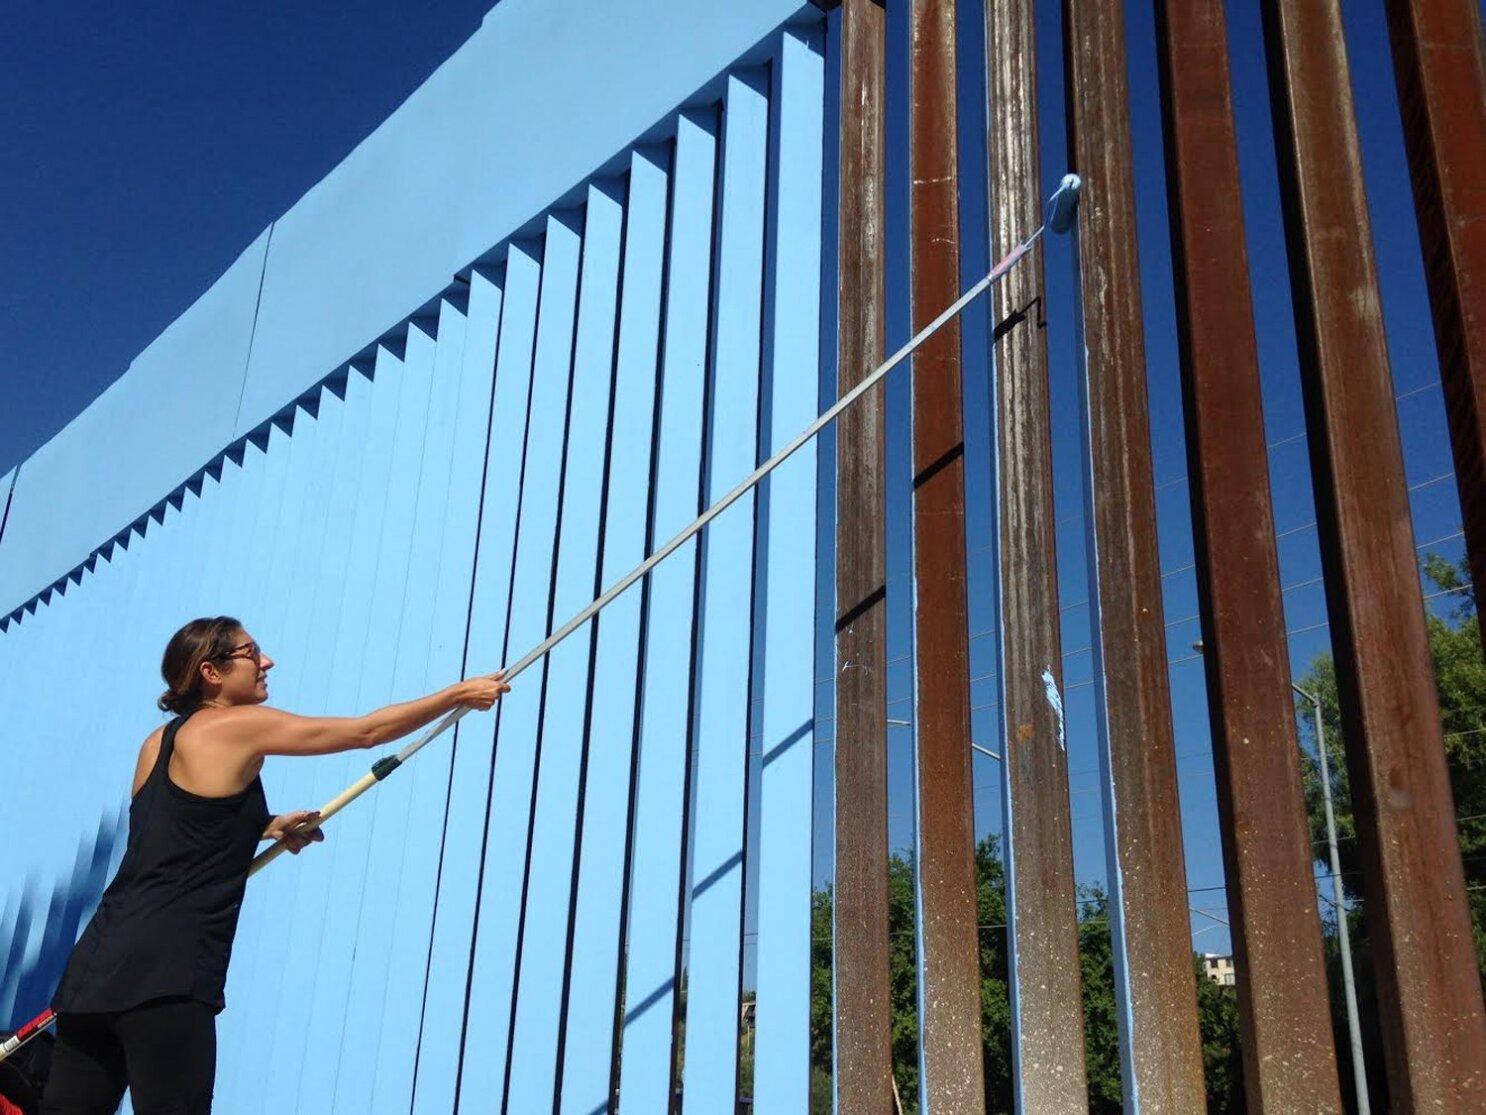 Readers React Trump S Idea To Paint Border Fence Black Raises Concerns The San Diego Union Tribune